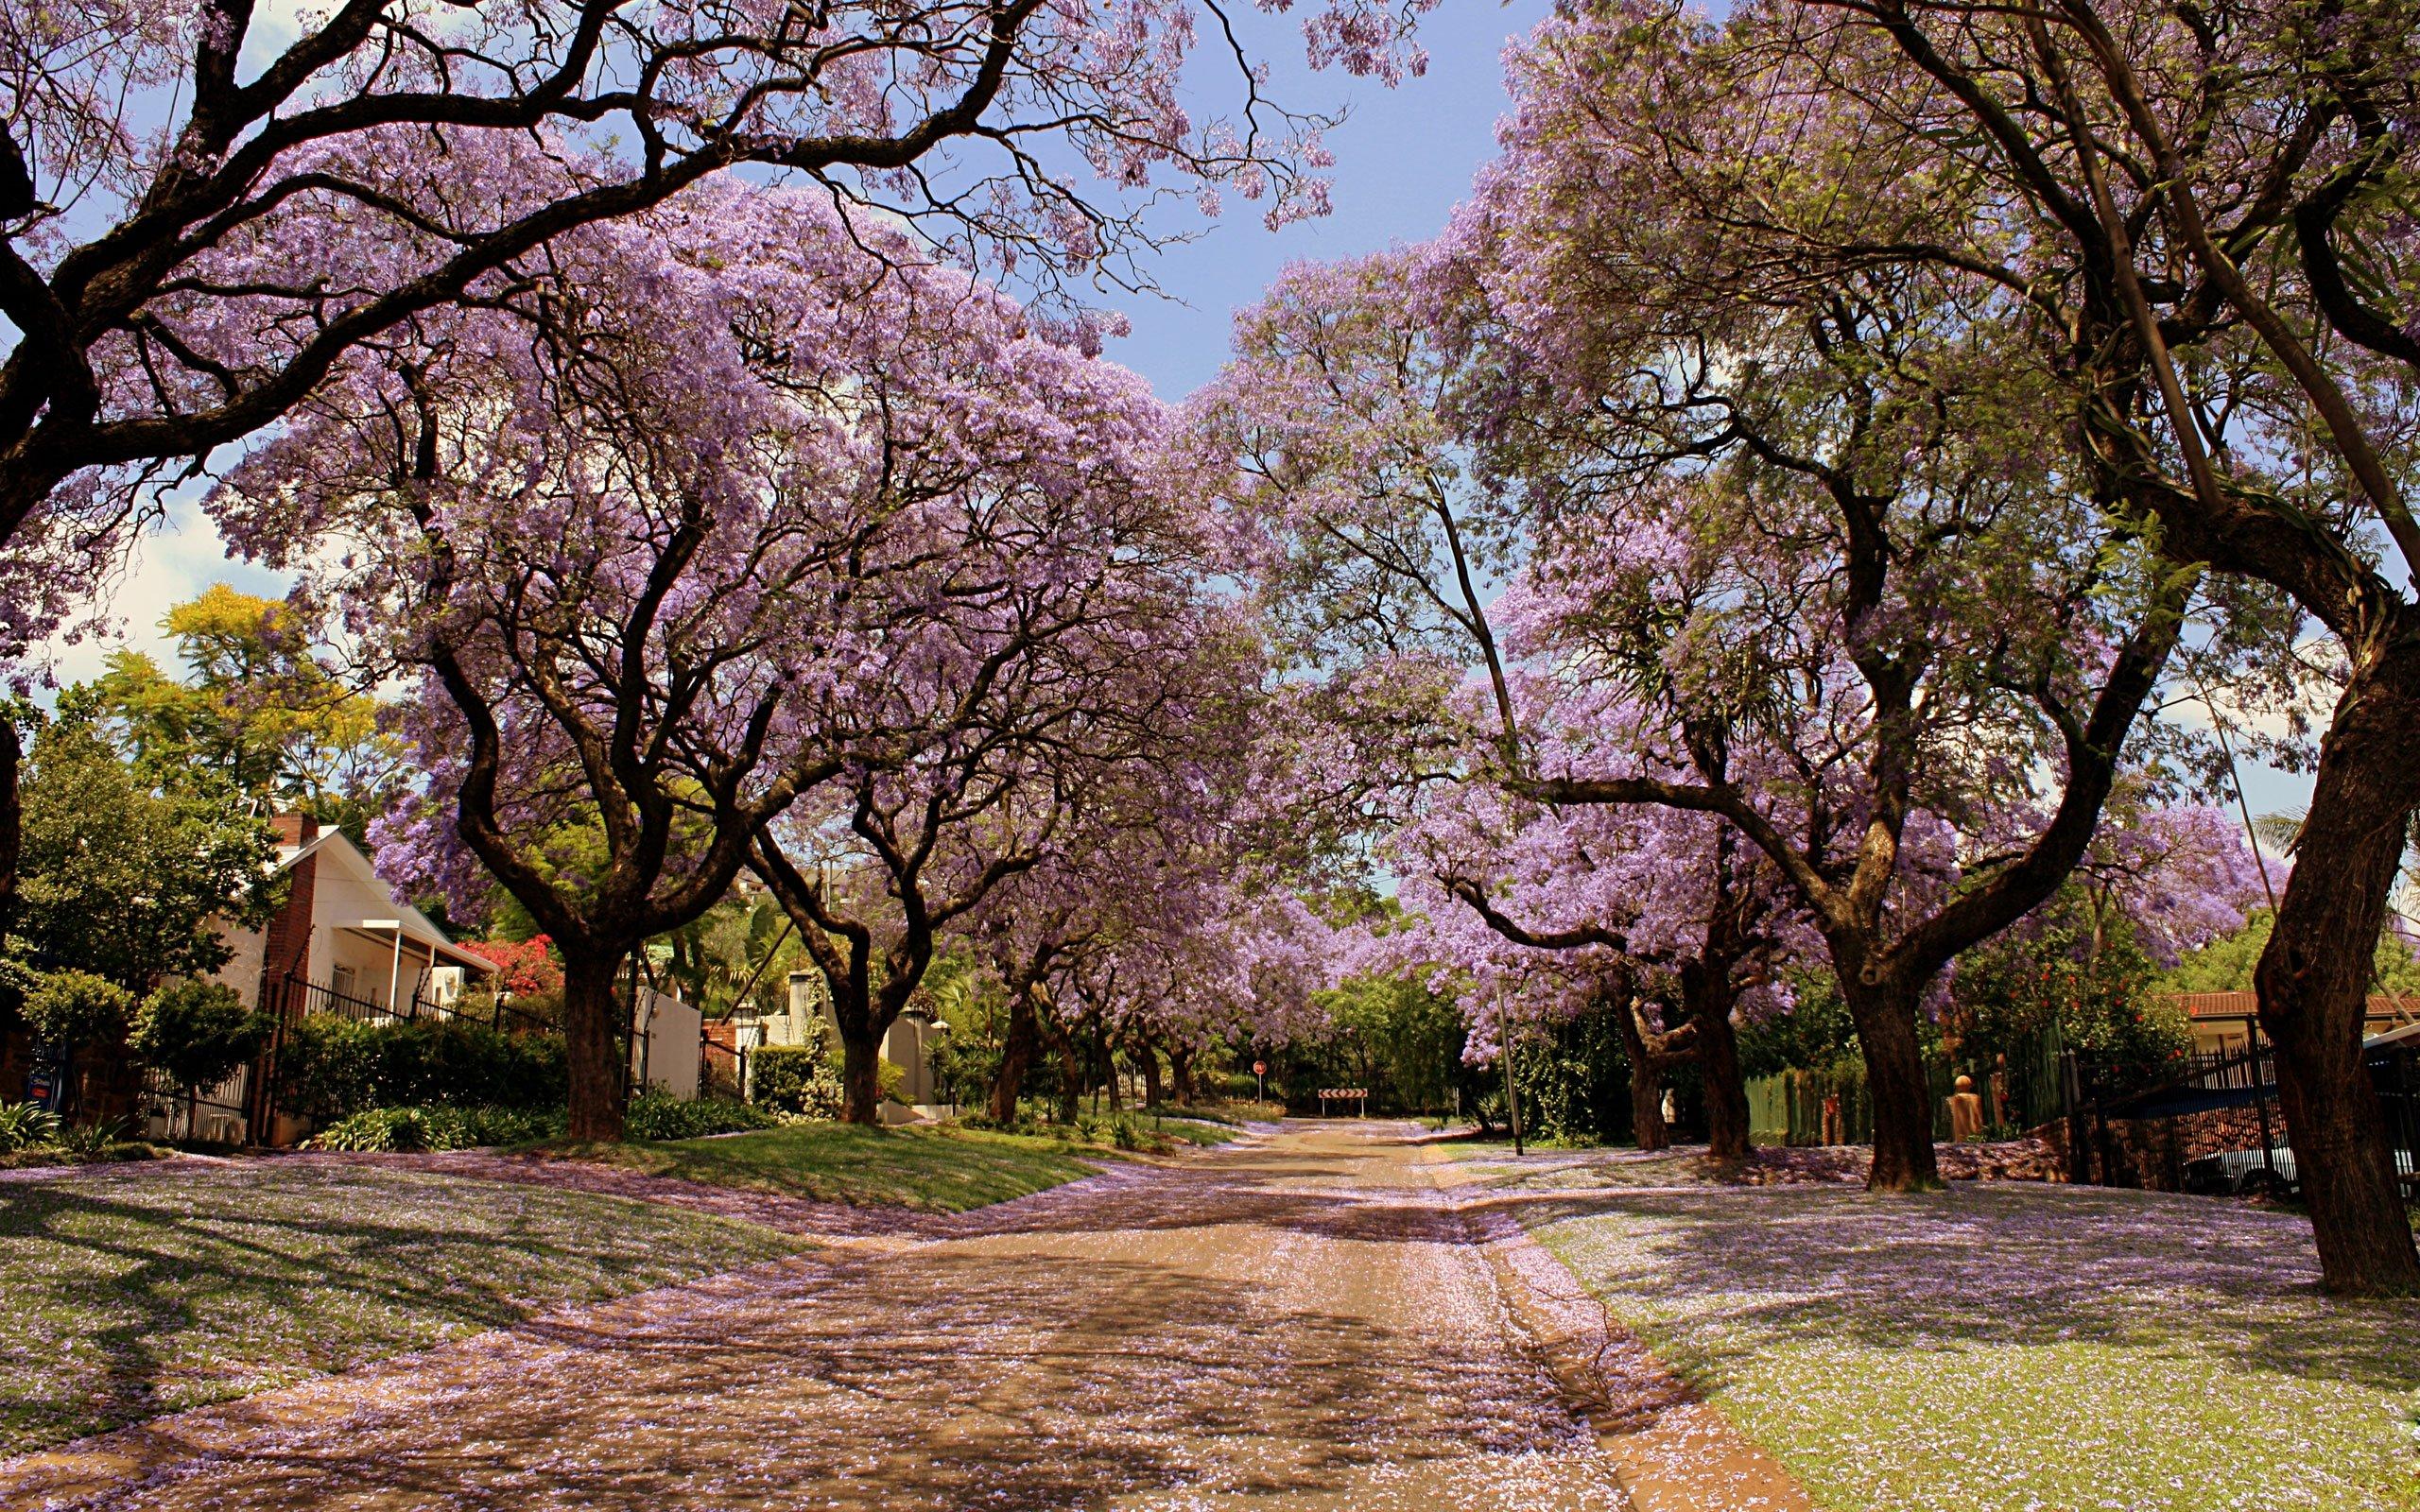 Sakura Tree Cherry Blossom Wallpapers Hd For Desktop Backgrounds